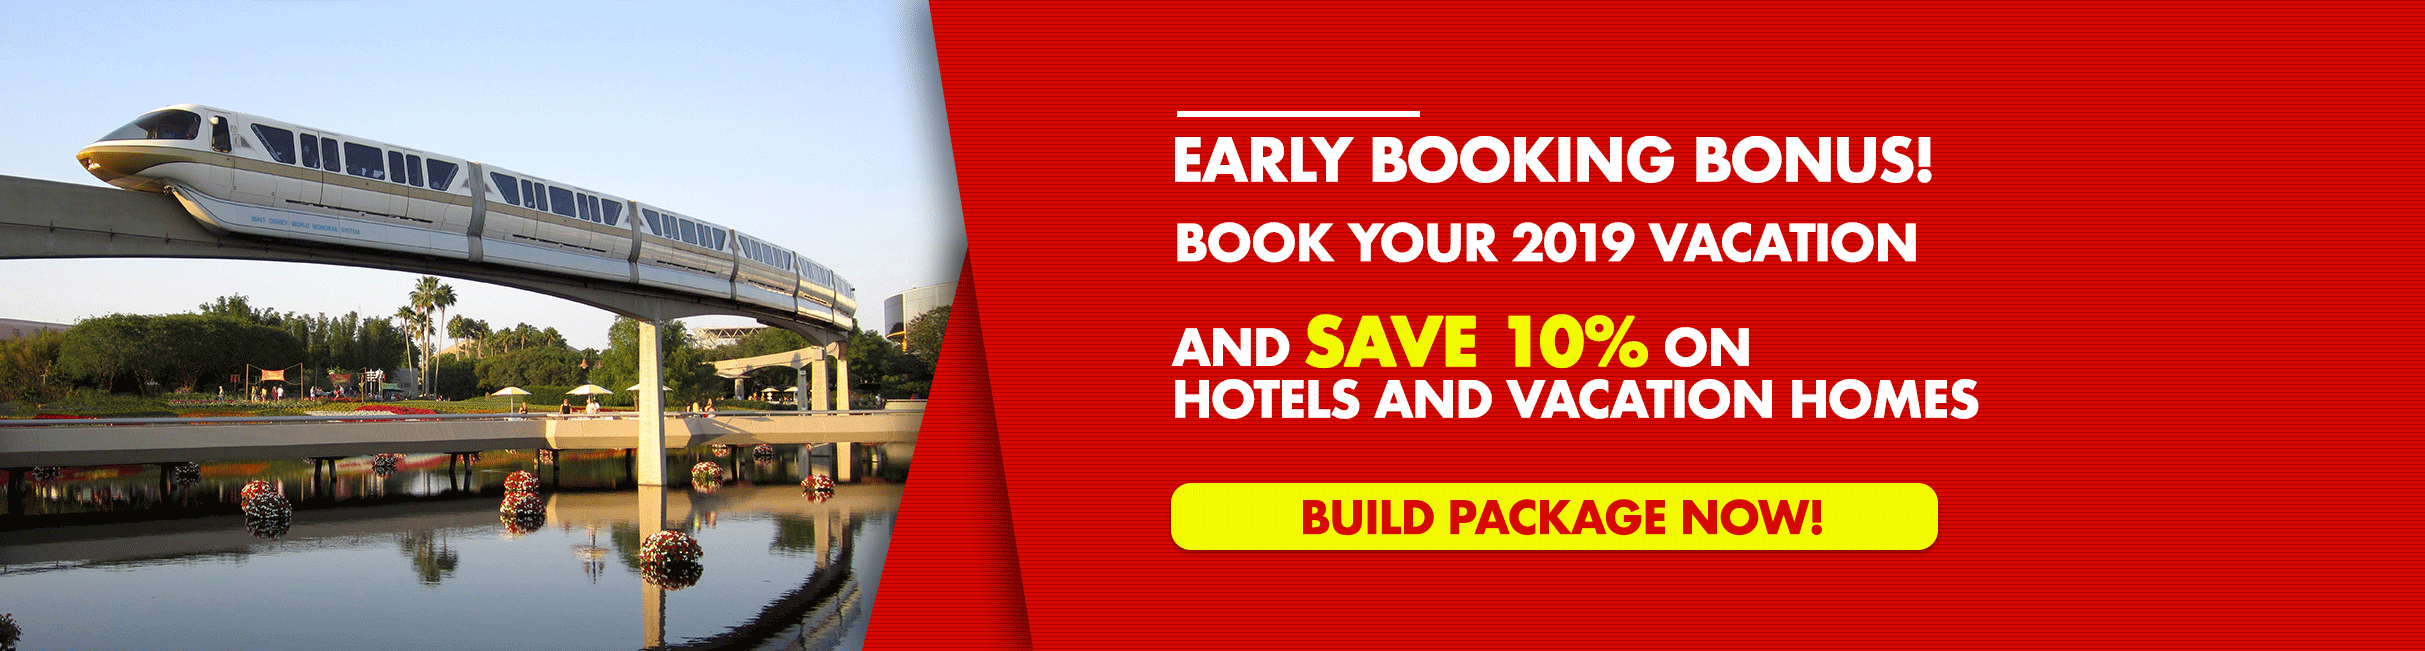 early_booking_bonus_slider-OrlandoVacation